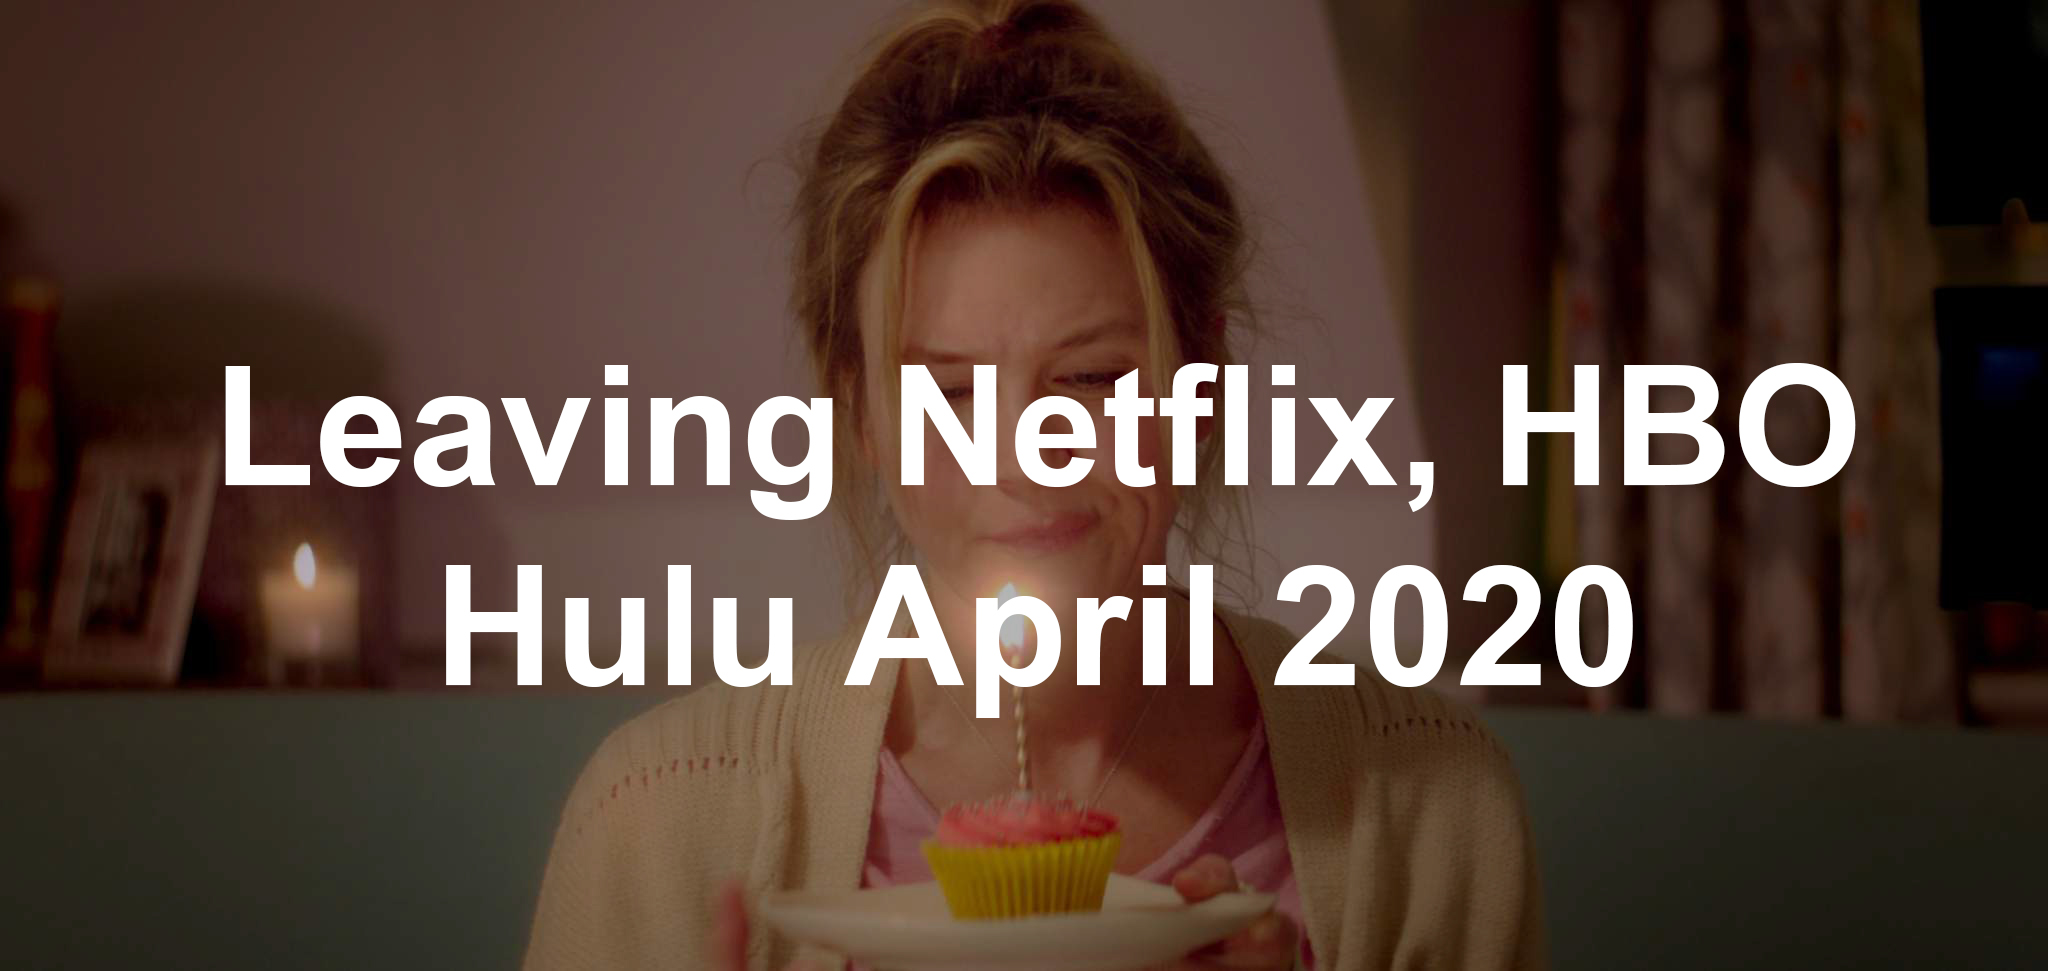 Leaving Netflix Hbo Hulu April 2020 Sfgate